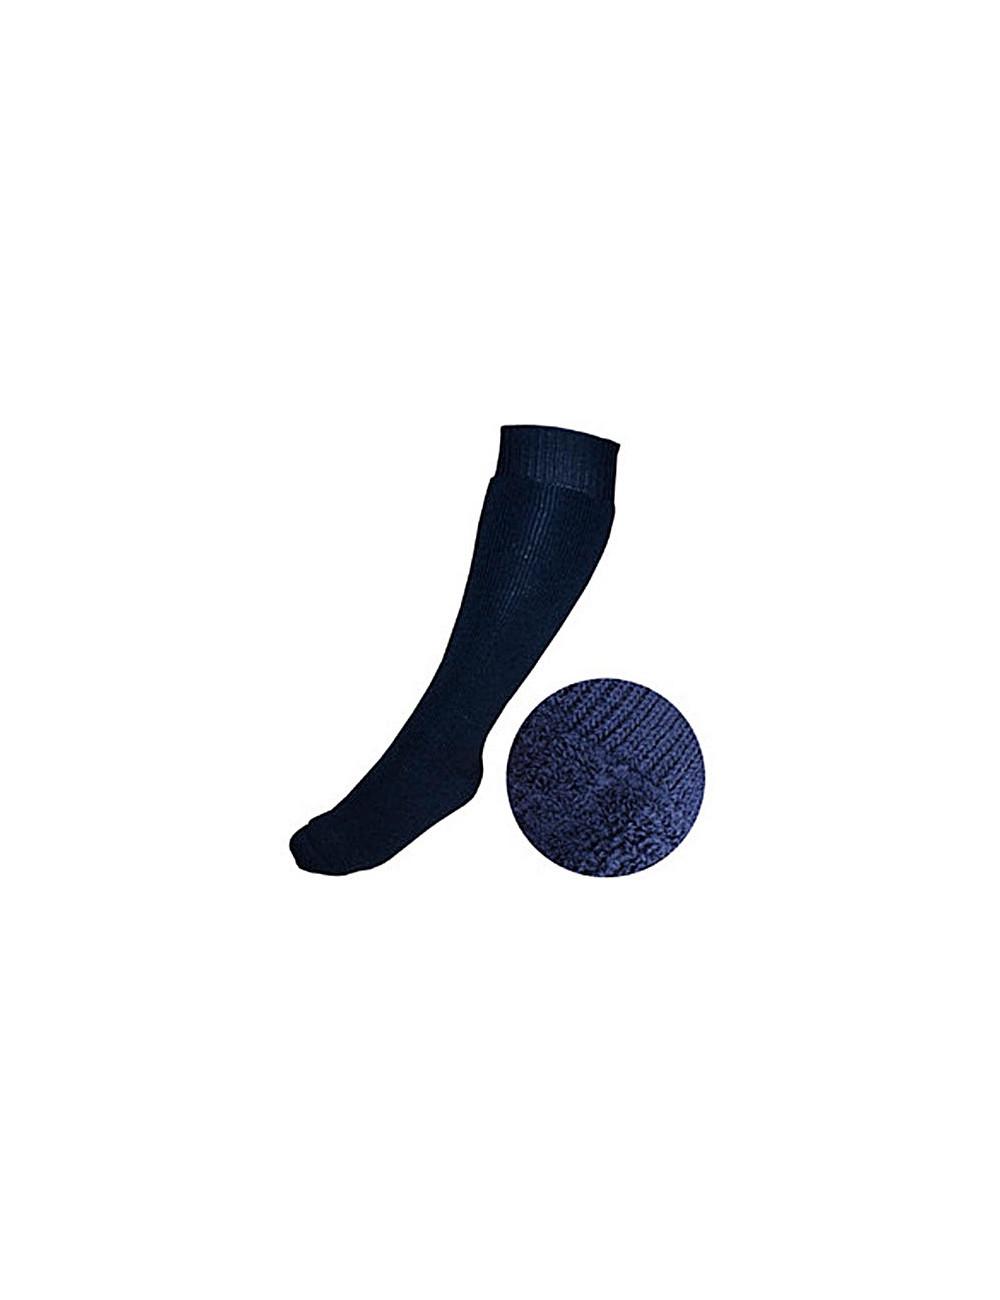 Skarpety wysokie Knee length Socks do chłodni i mroźni.